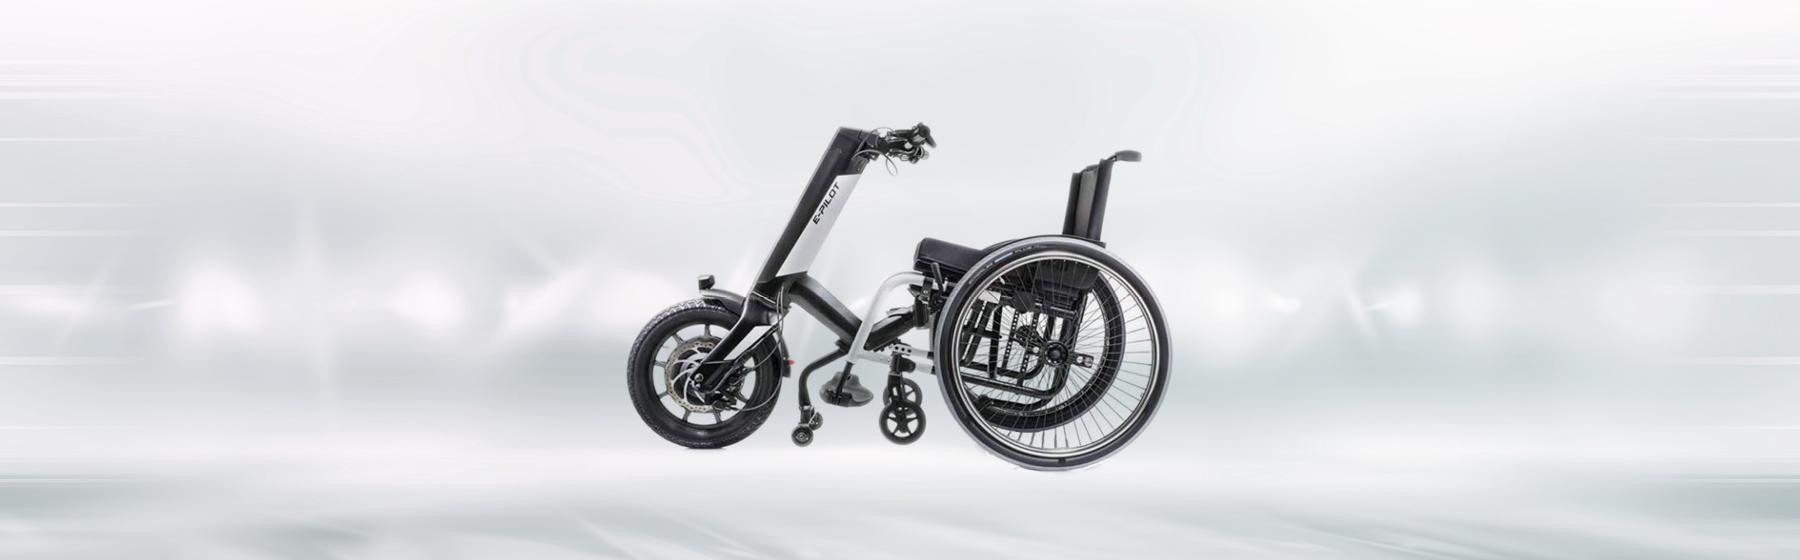 SMB-Mobilitaet-Rubrikenmotiv-Rollstuhlantriebe